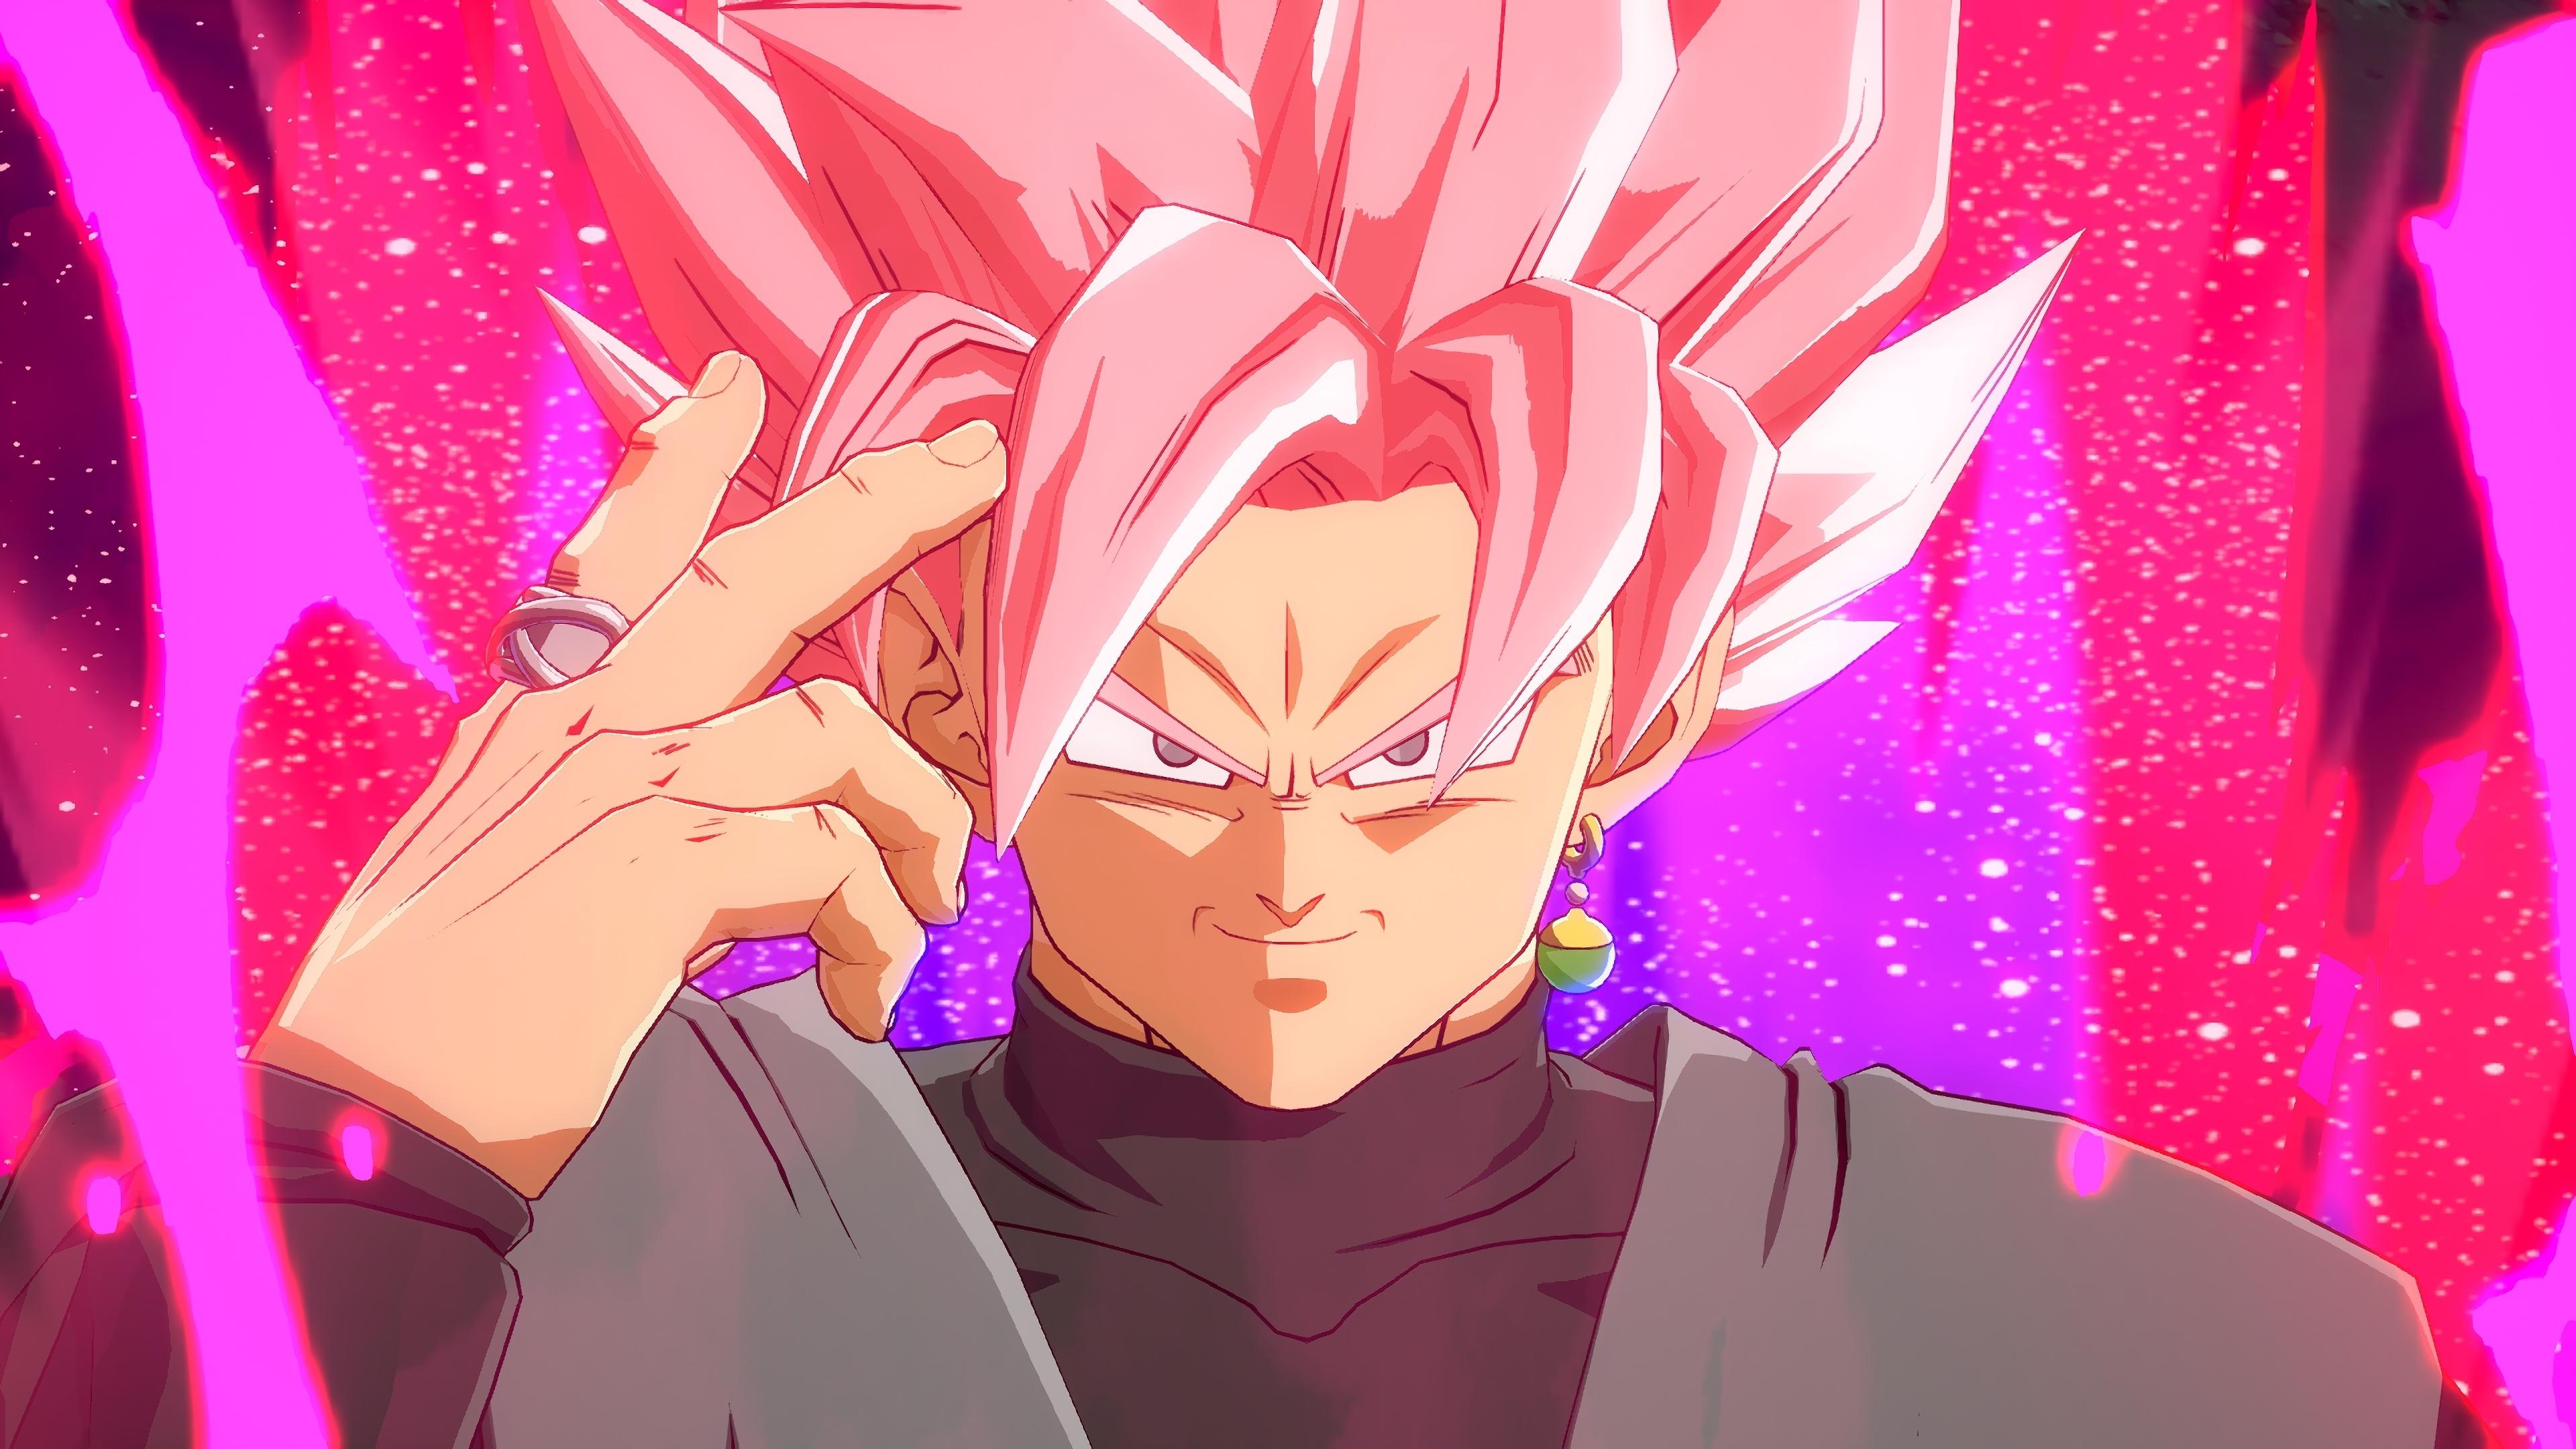 Artwork Black Goku Dragon Ball Super Wallpaper Dragonball Fighterz Goku Black 3840x2160 Wallpaper Teahub Io